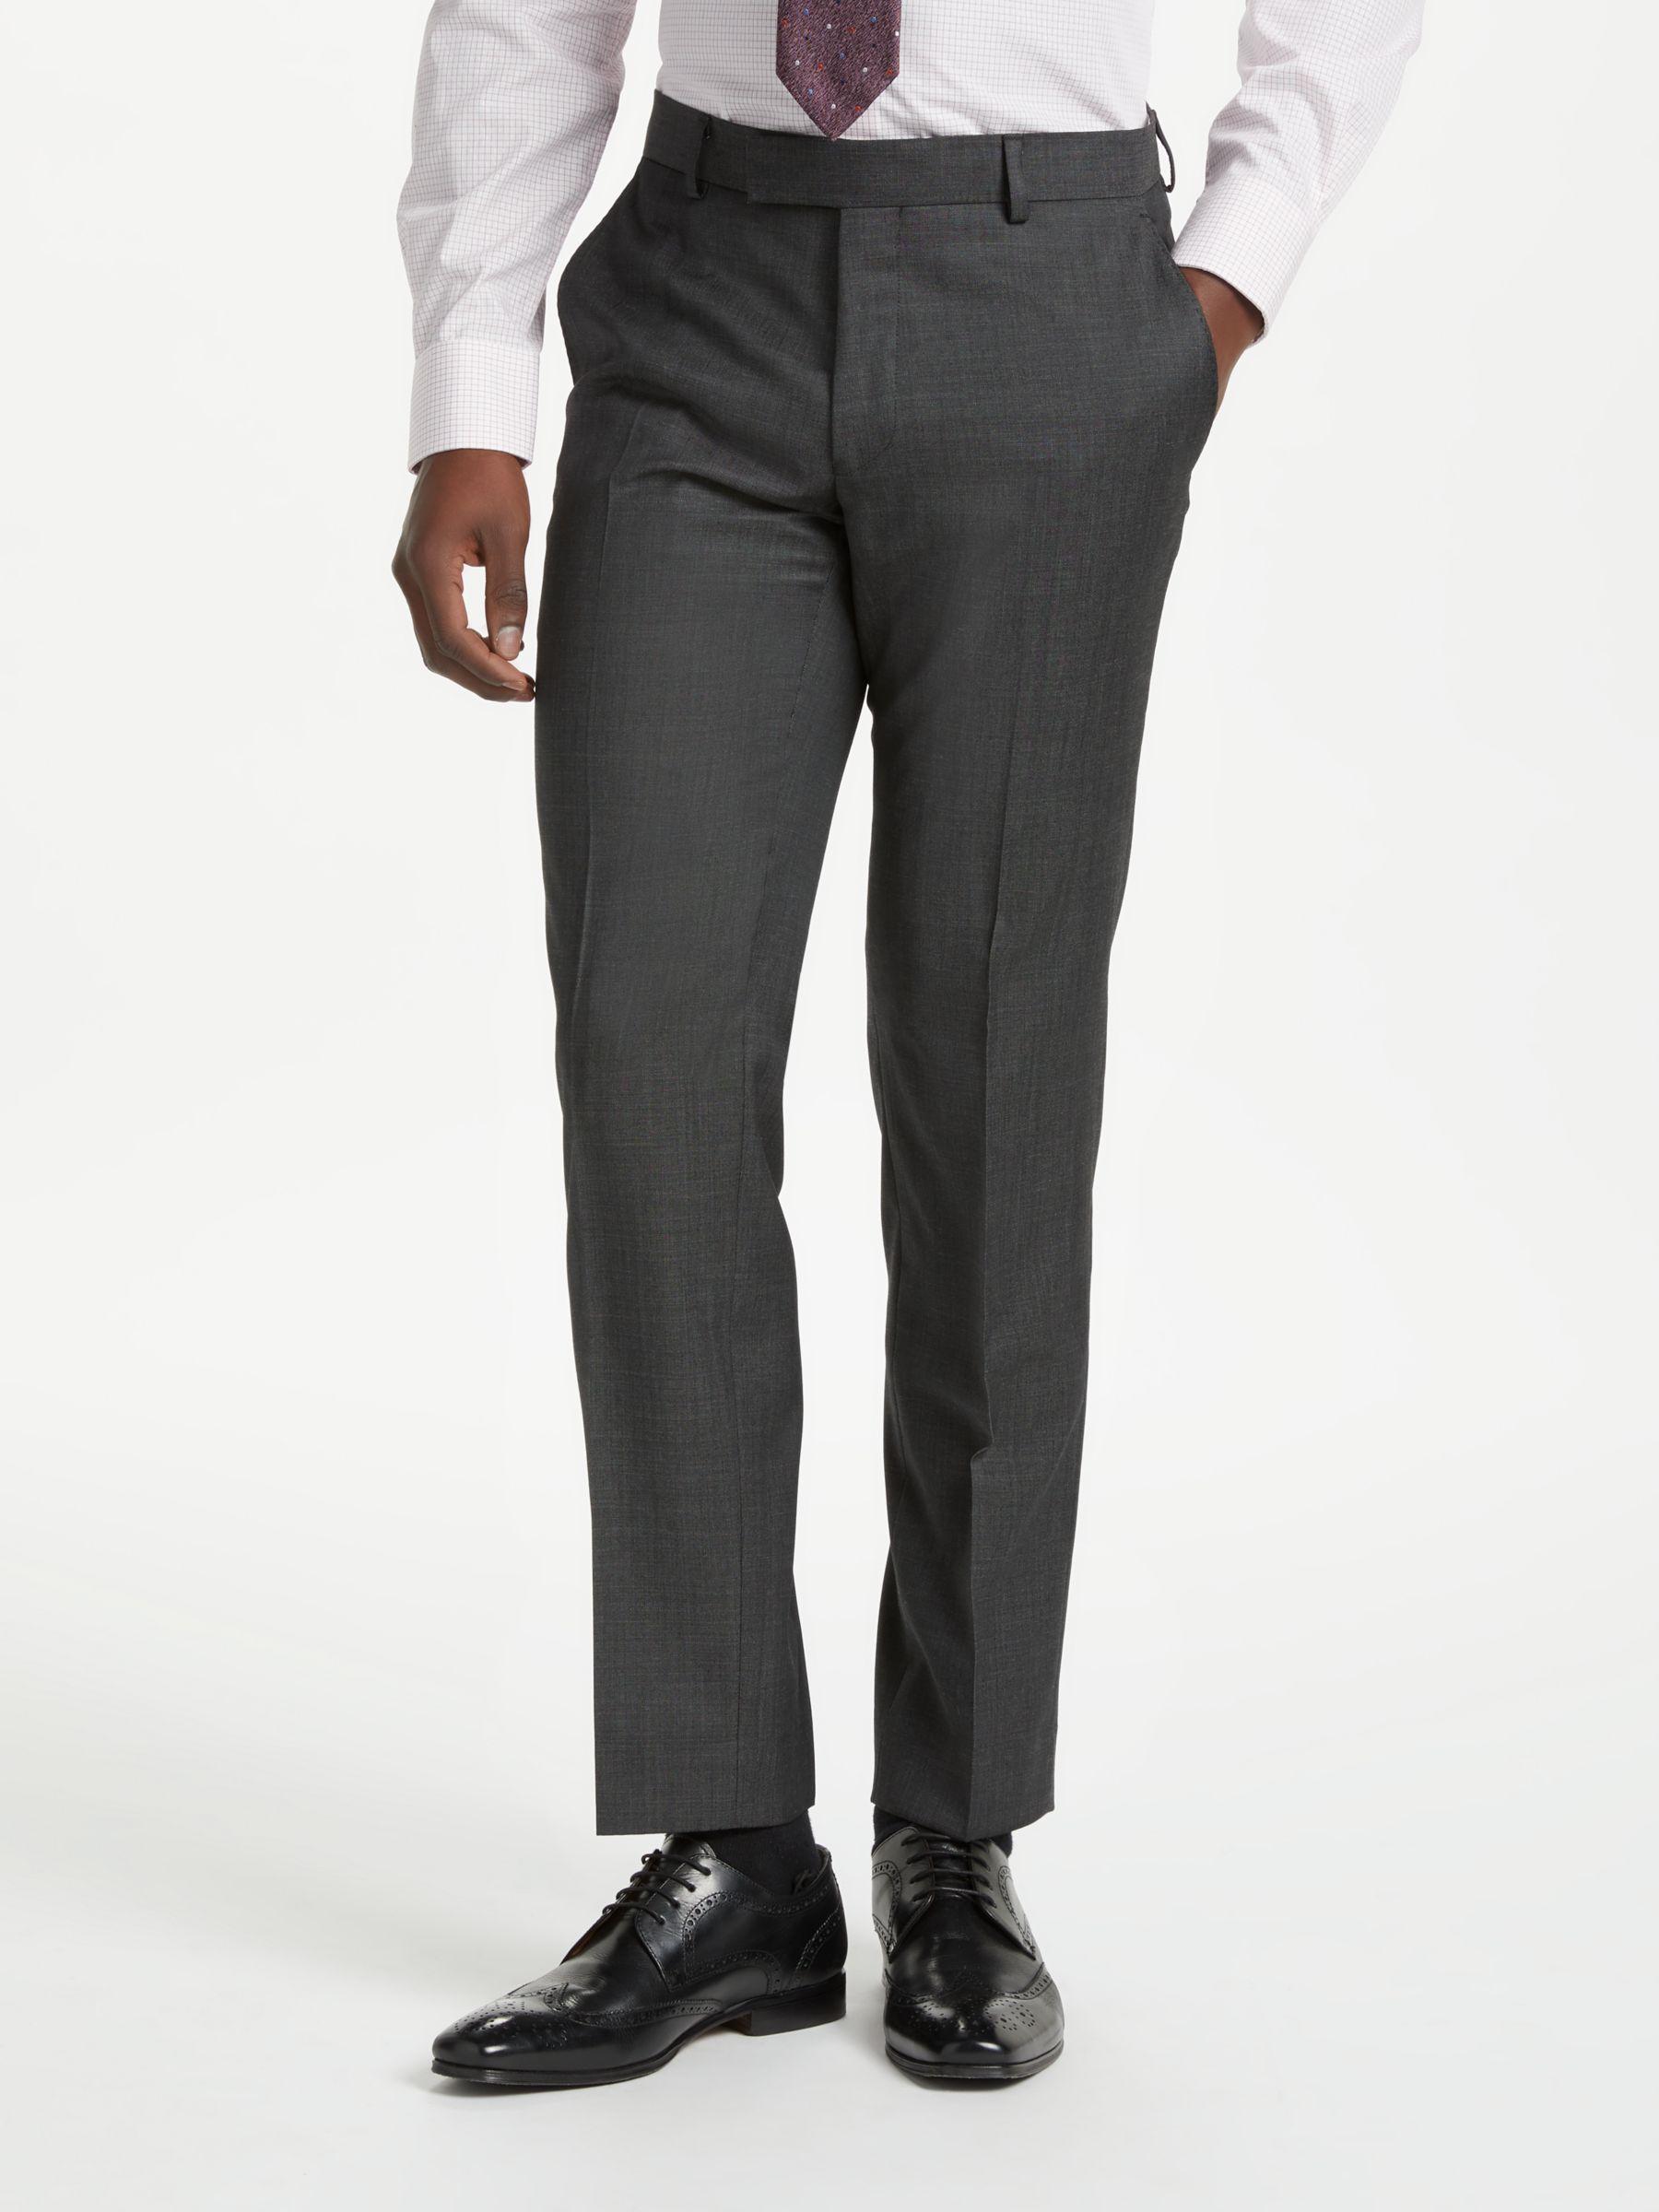 Richard James Mayfair Richard James Mayfair Wool Pindot Slim Fit Suit Trousers, Charcoal